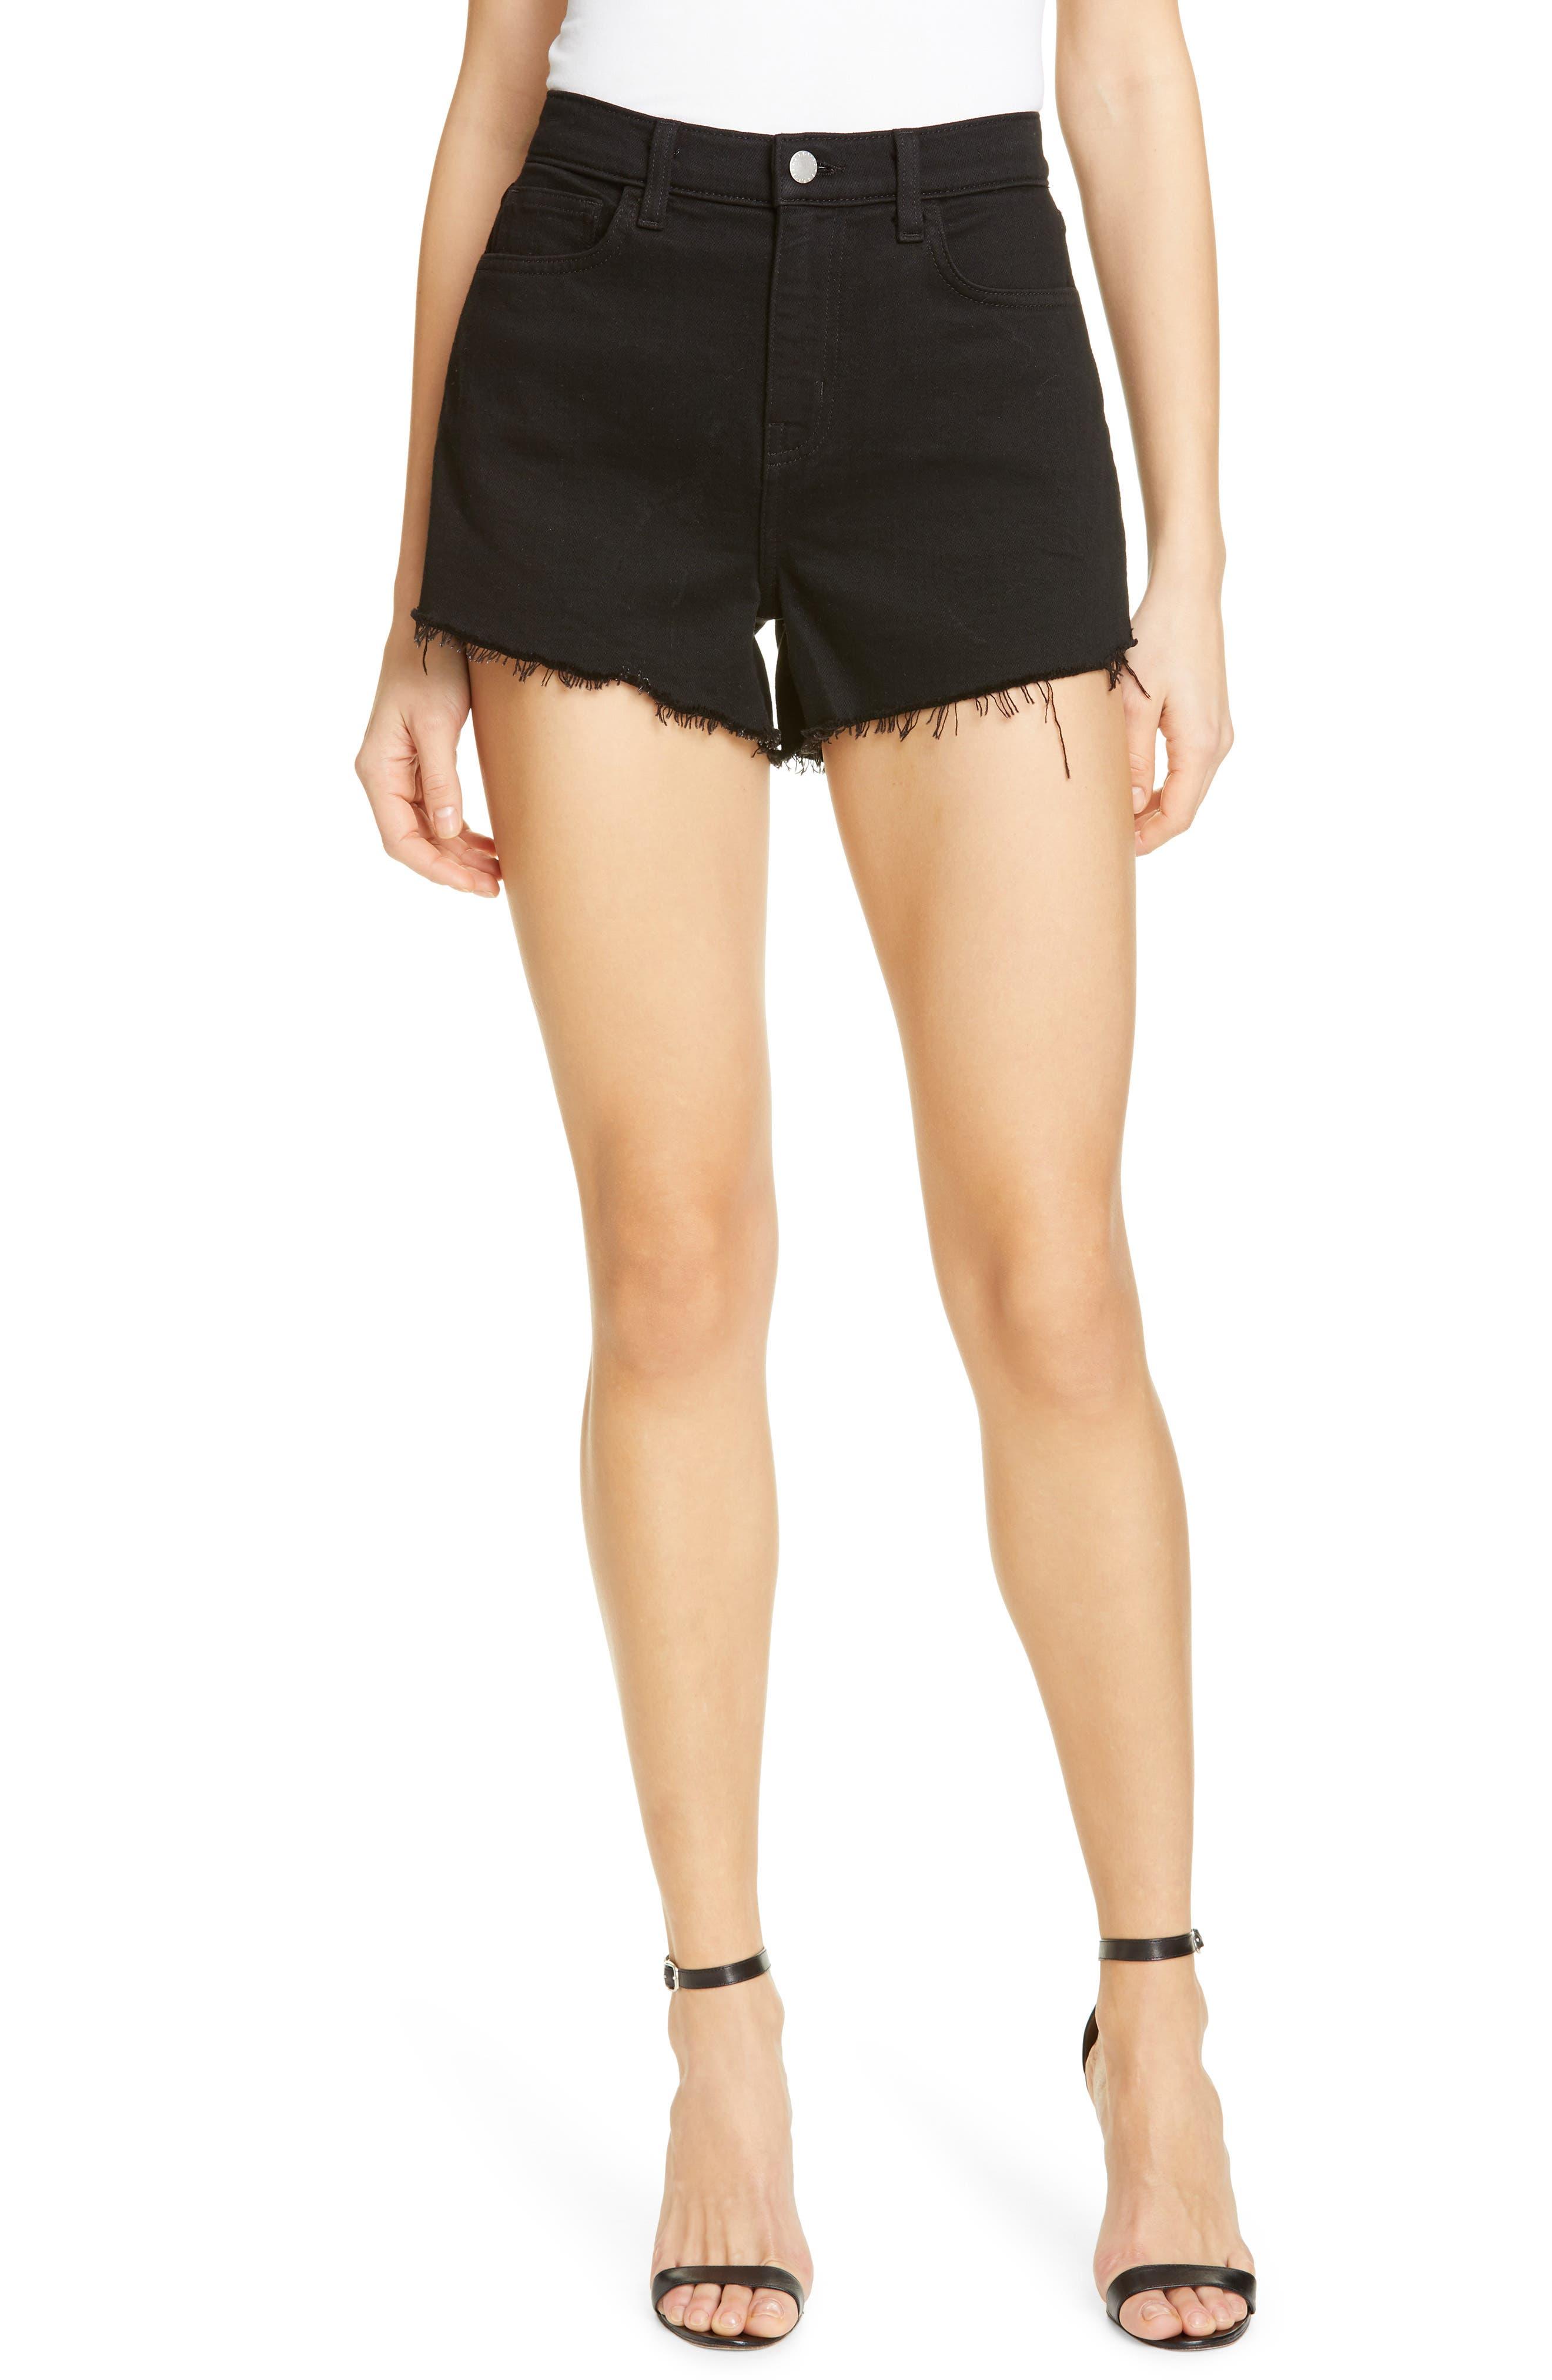 L'AGENCE Ryland High Waist Denim Shorts, Main, color, NOIR